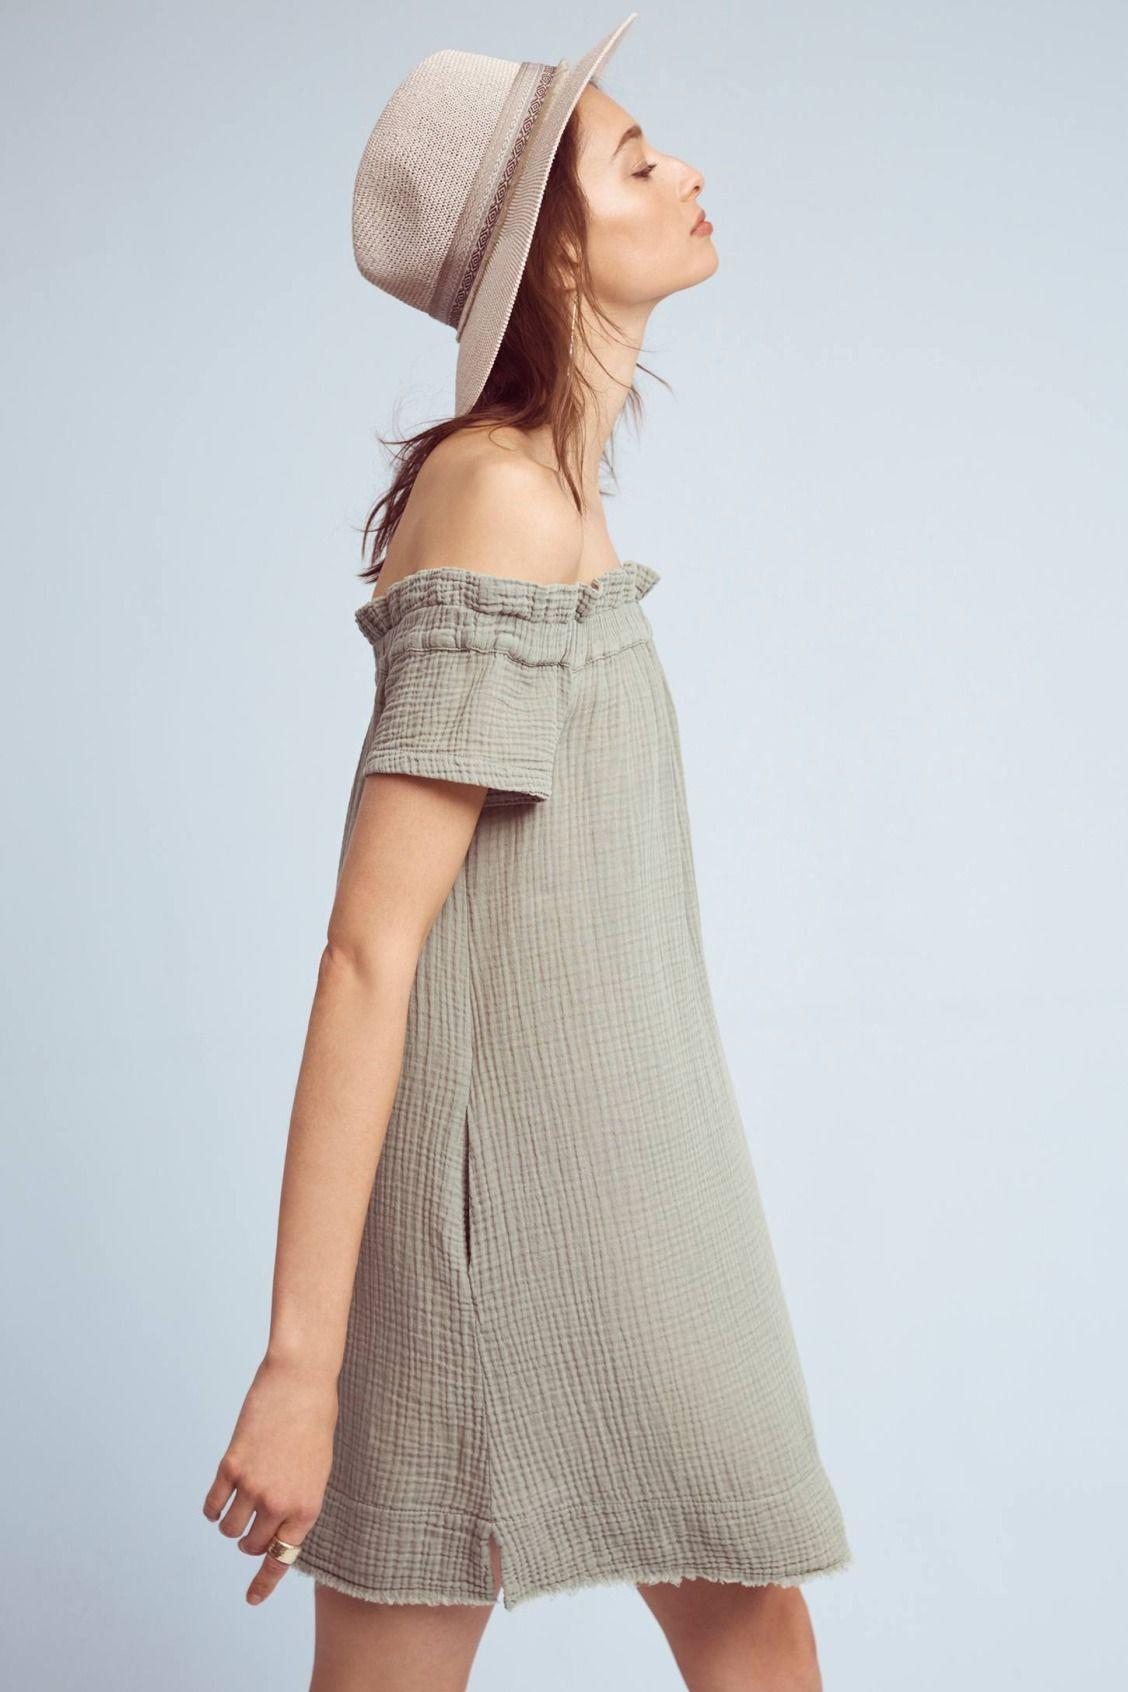 a5784ac9a22a Maella Off-The-Shoulder Tunic Dress